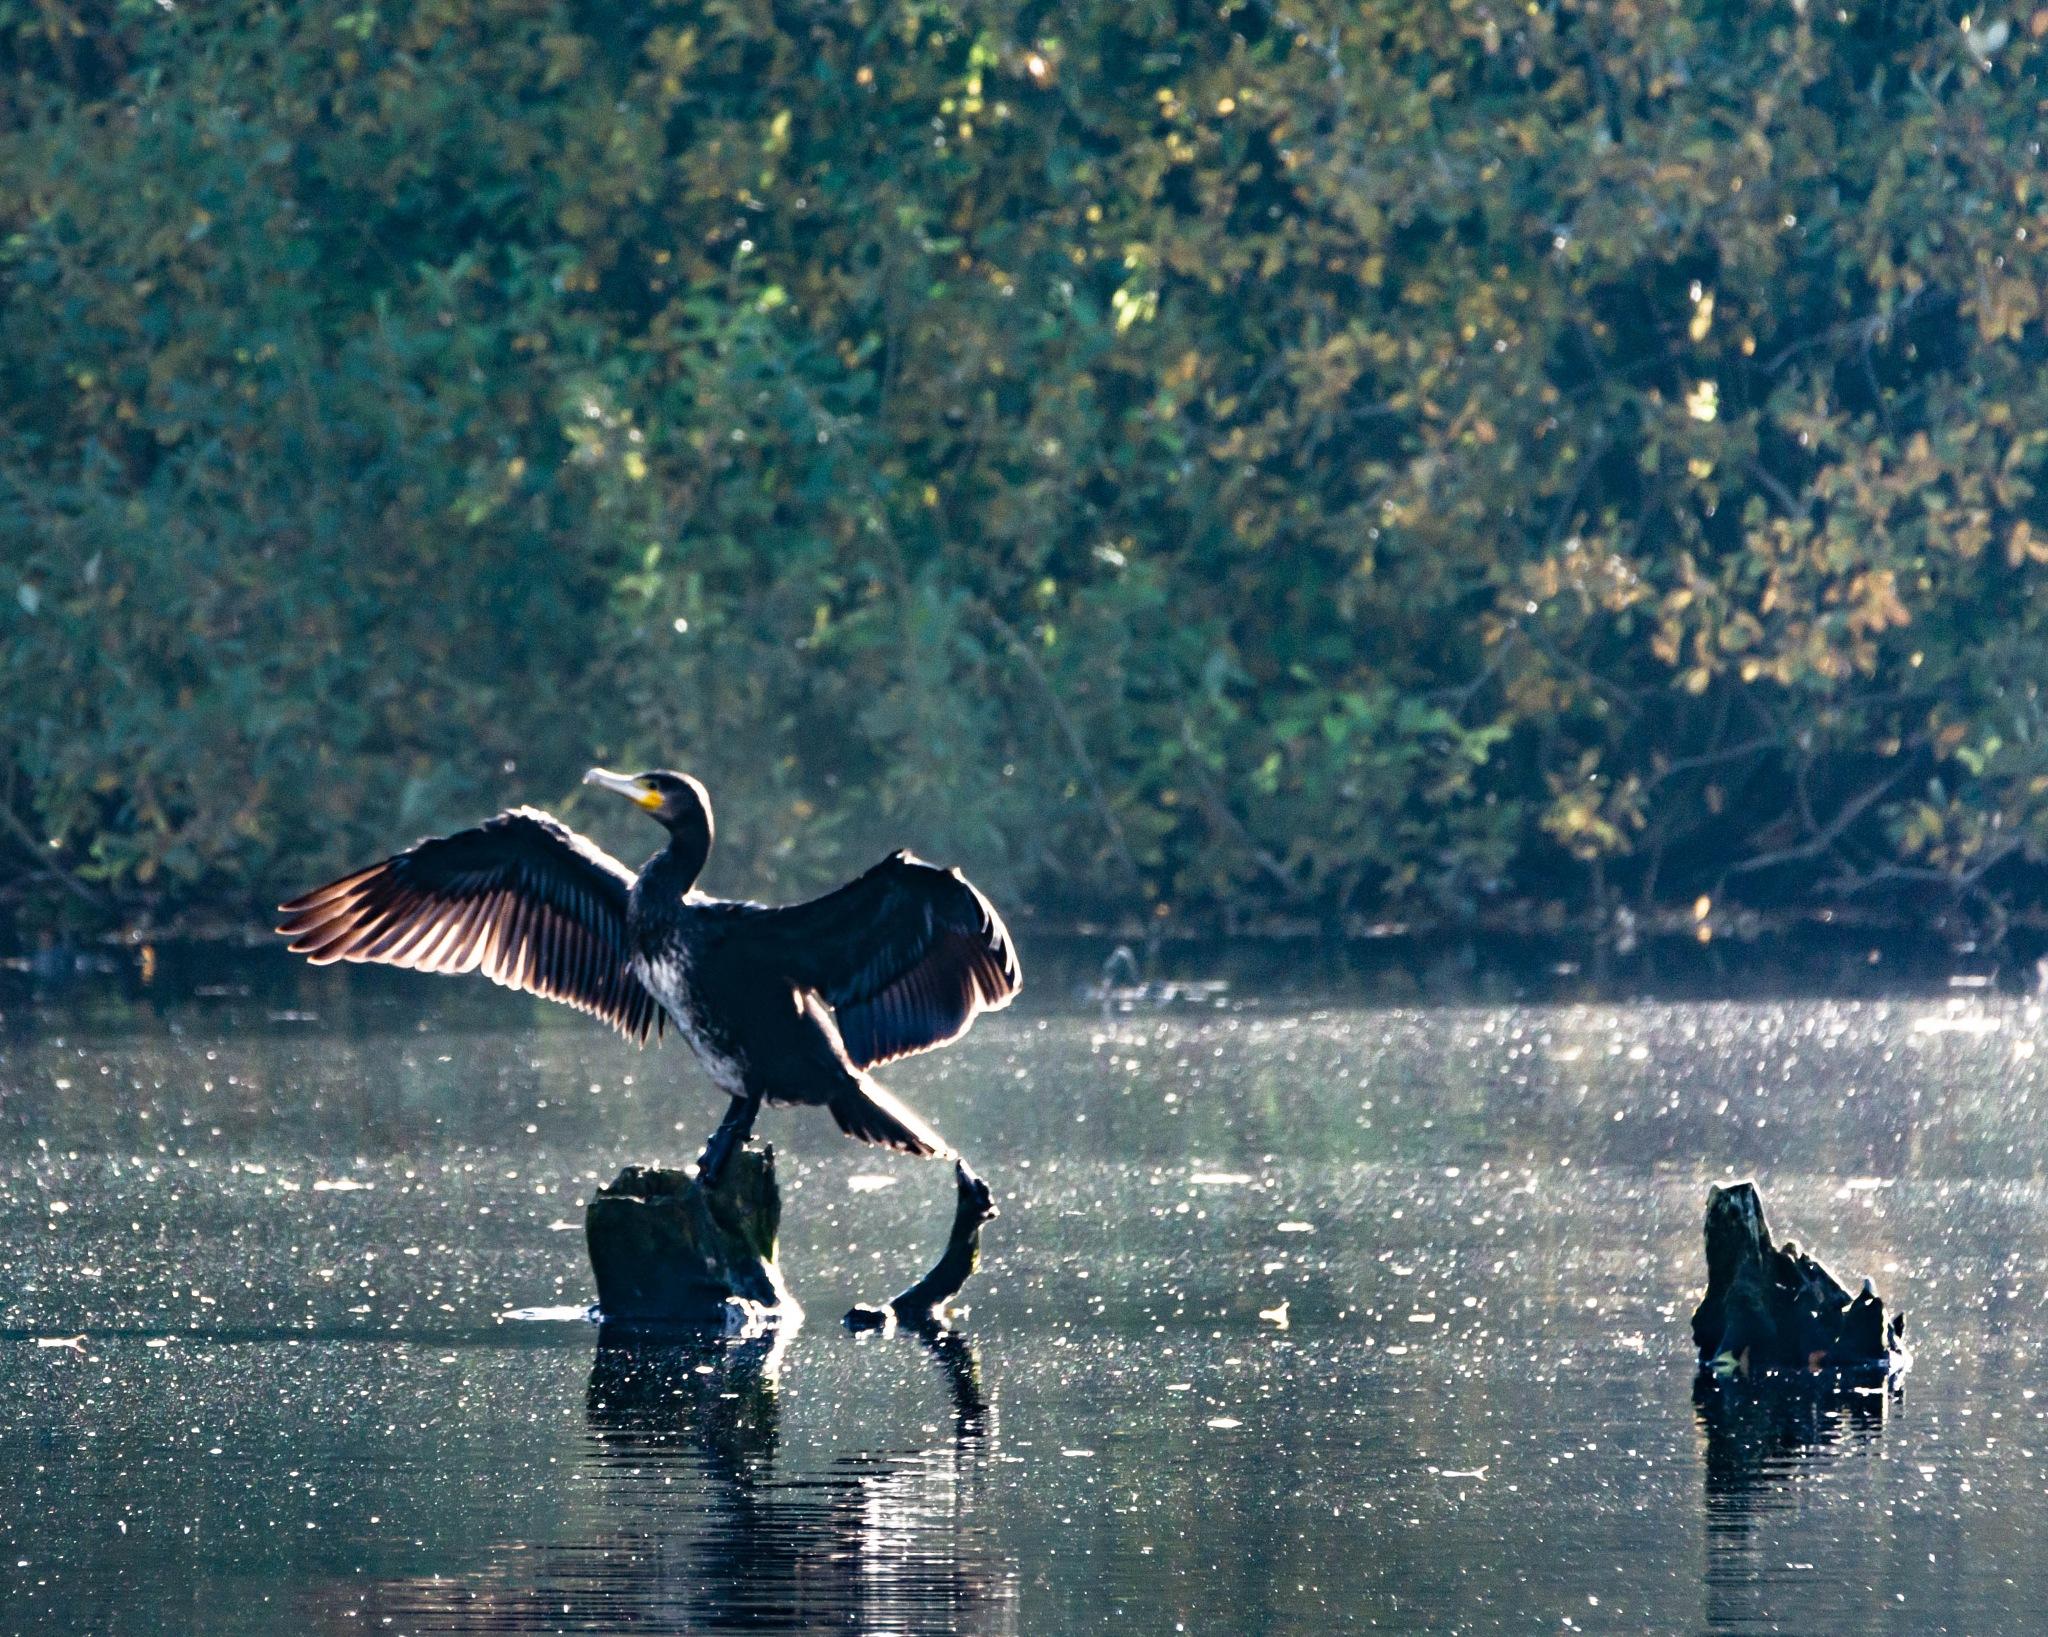 Storskarv  (Phalacrocorax carbo) by Johnny Lythell